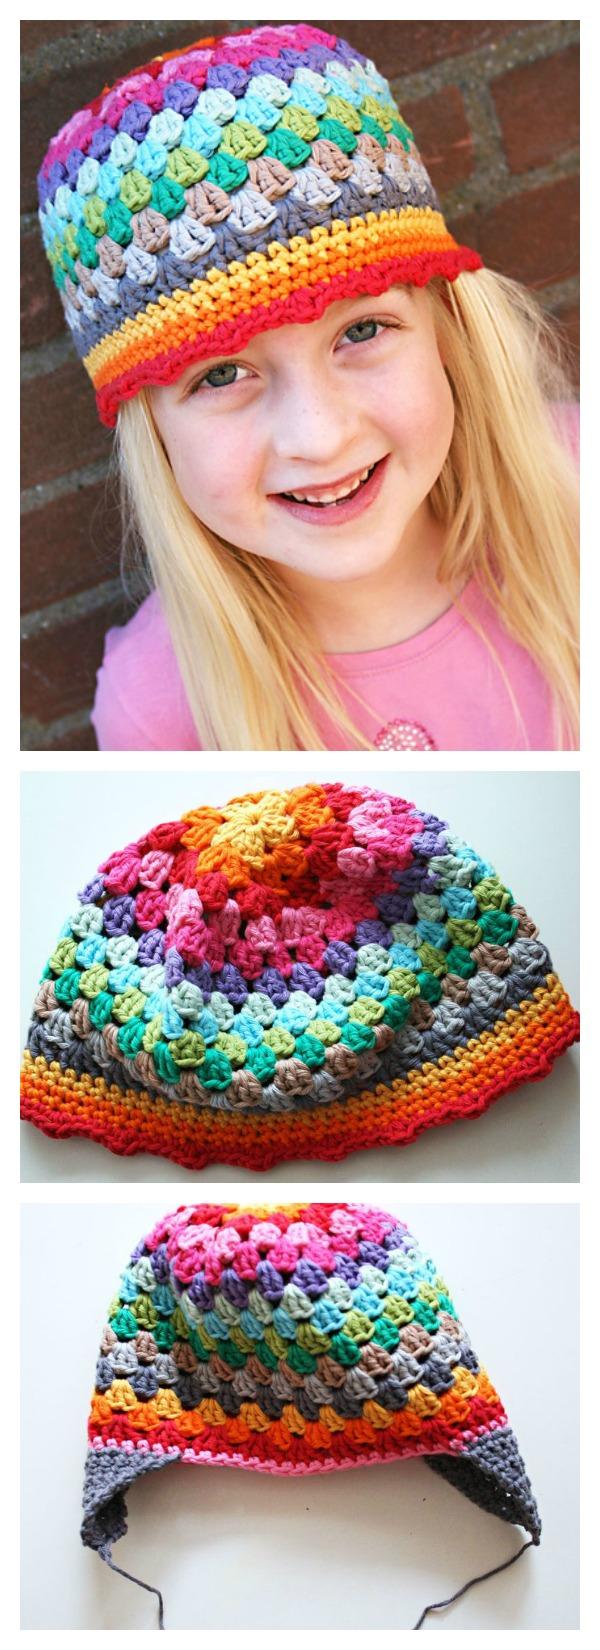 Granny Stitch Rainbow Beanie Hat Free Crochet Pattern 26c719378d3